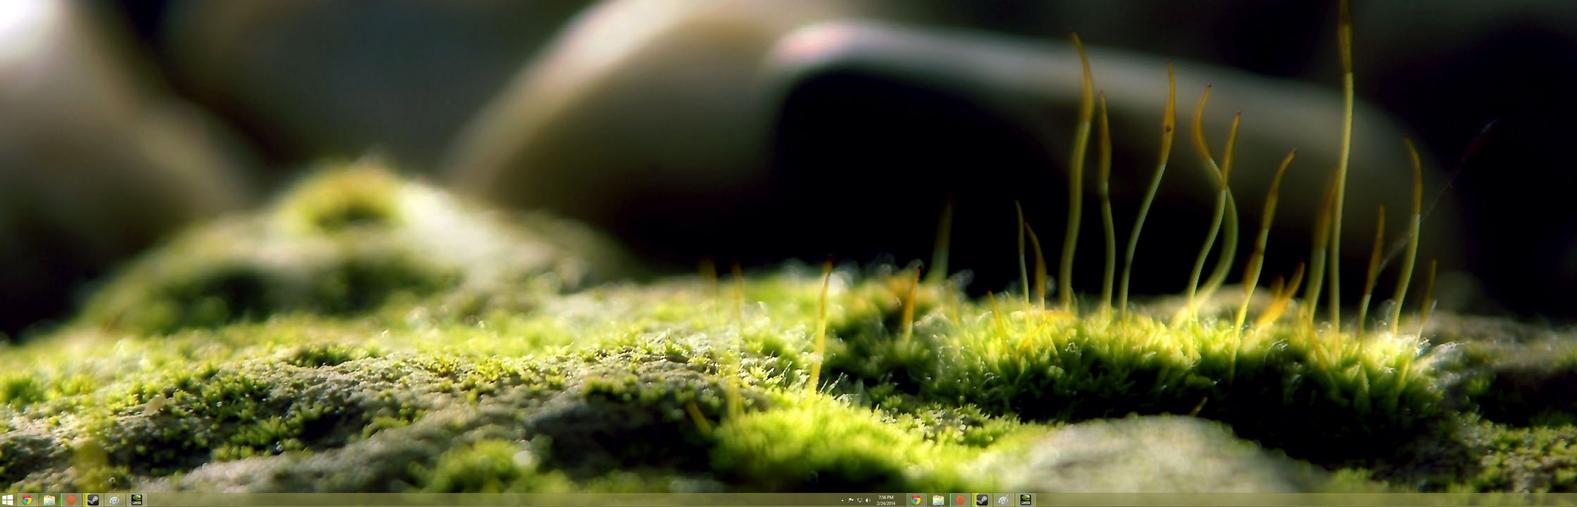 february_2014_desktop_screenshot__window